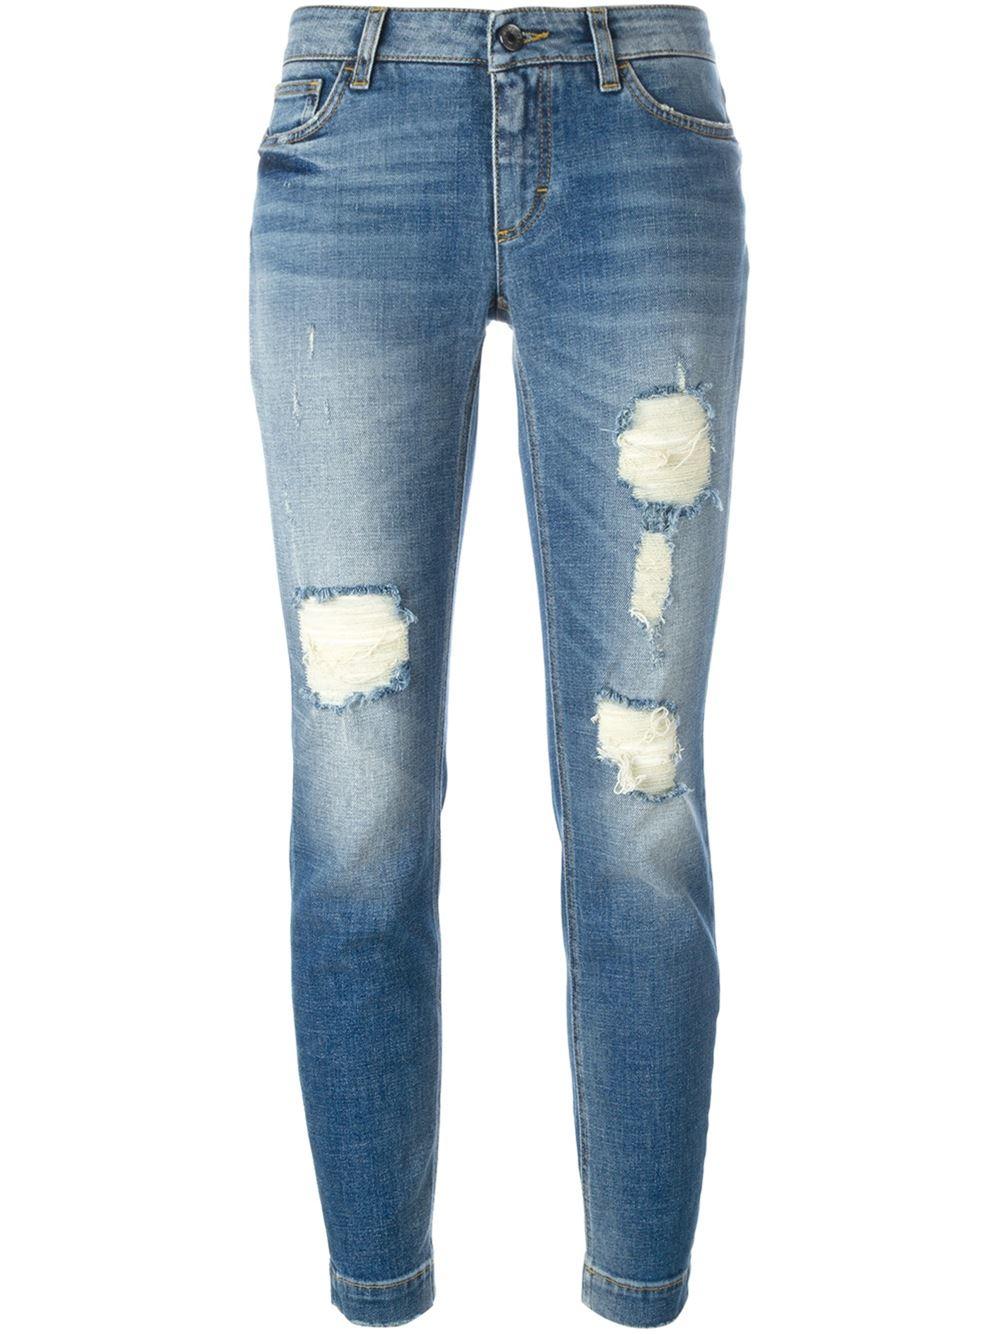 dolce gabbana distressed jeans in blue lyst. Black Bedroom Furniture Sets. Home Design Ideas